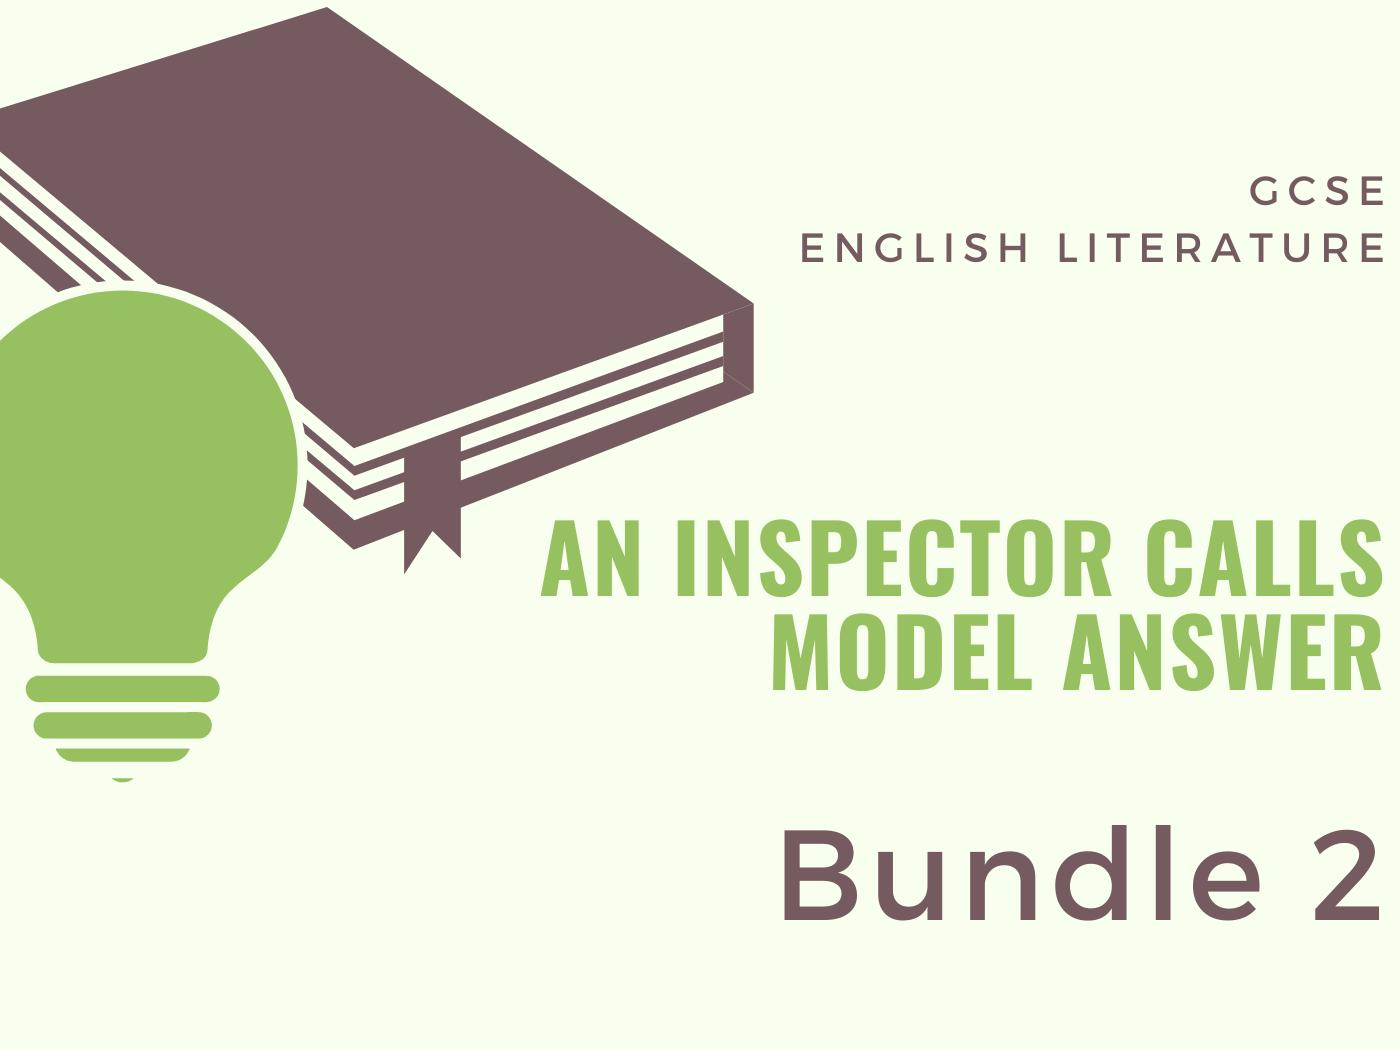 An Inspector Calls - Model Answers: Bundle 2